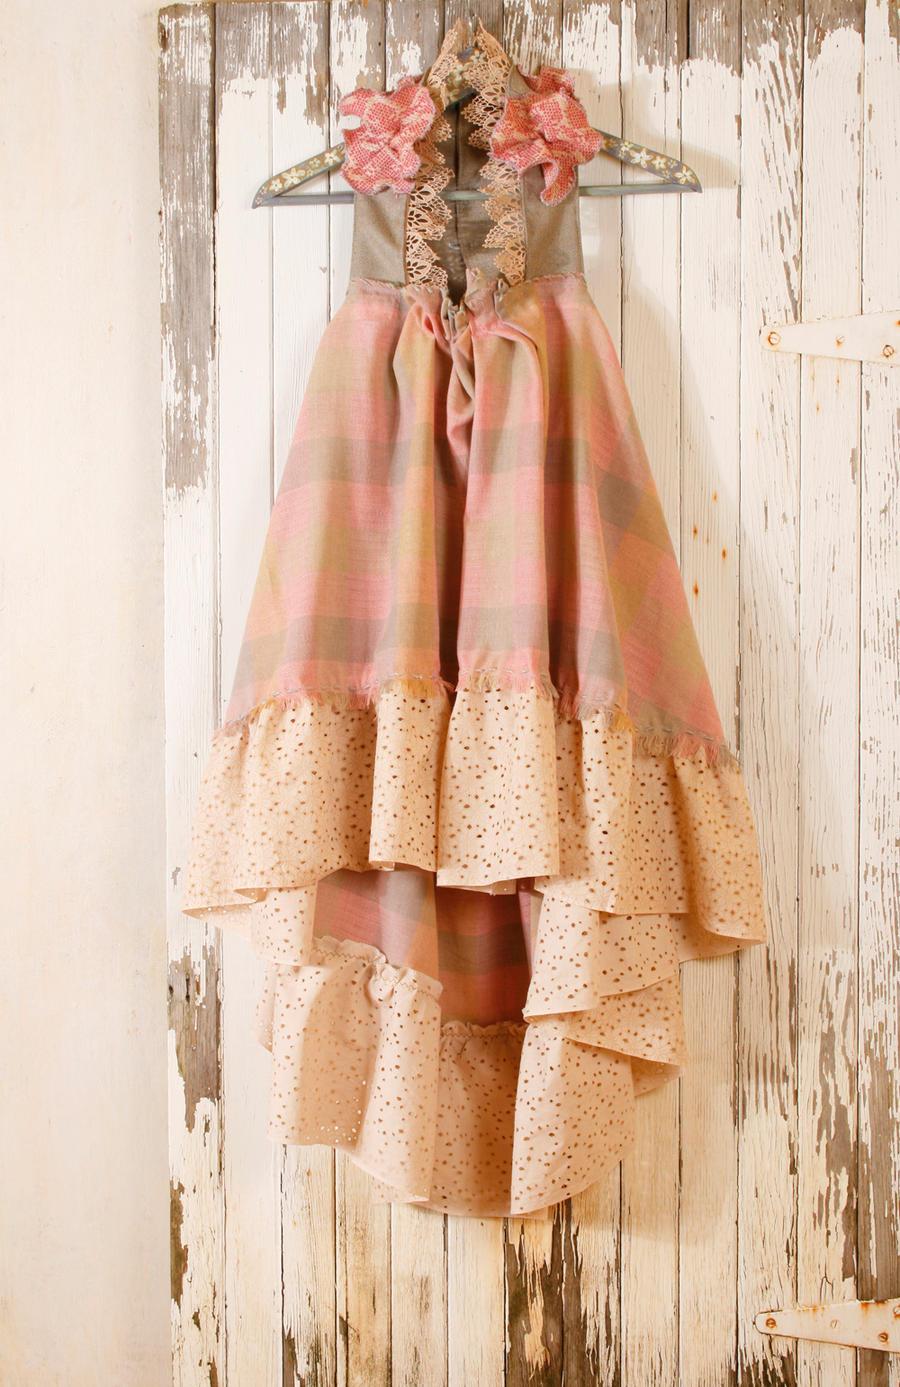 Shabby Chic Halter Dress In Pastel Gingham By Mynoush On